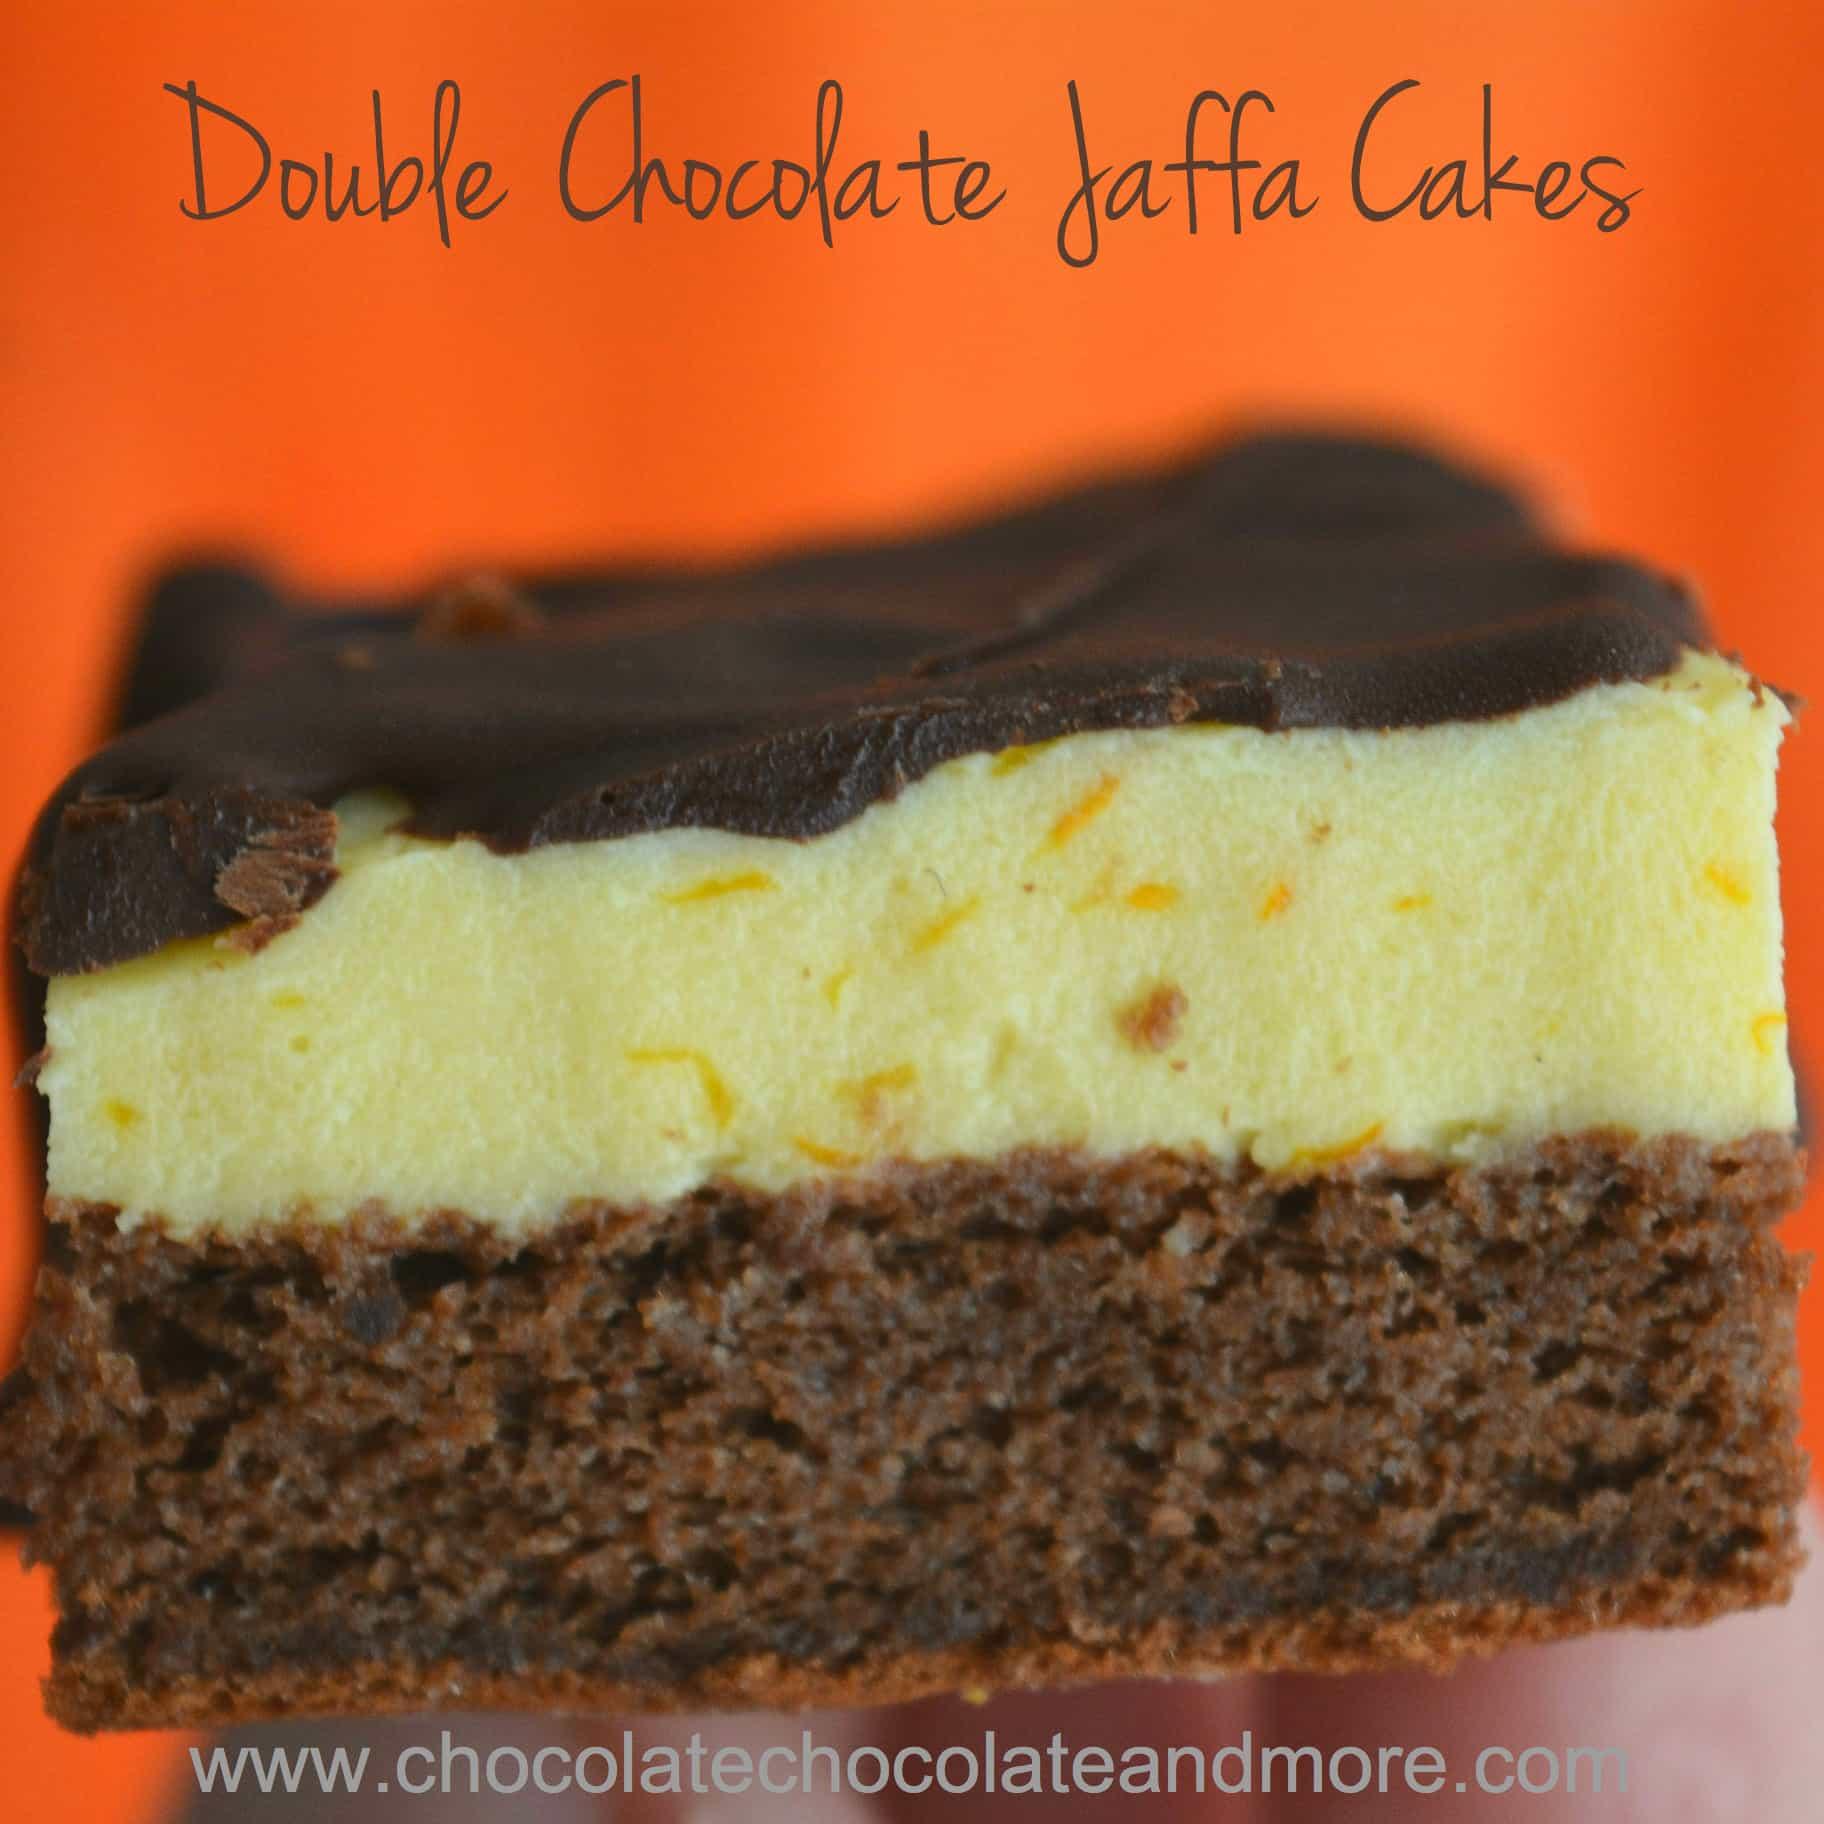 Double Chocolate Jaffa Cakes